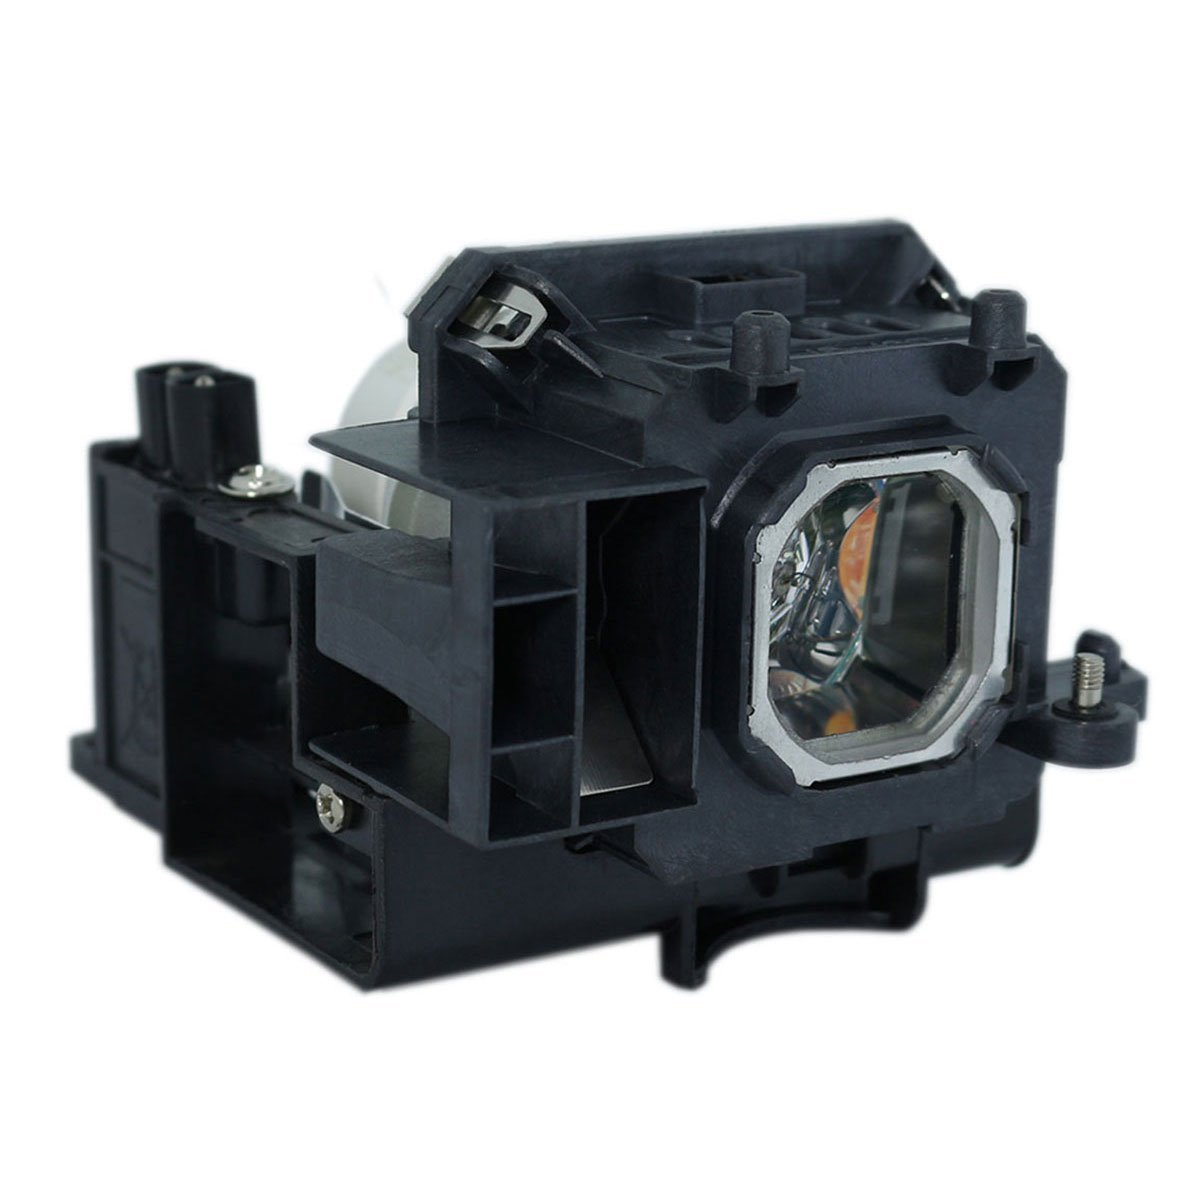 /Schwarz//Grau lutema NEC np16lp-p04/Ersatz DLP//LCD Cinema Projektorlampe/